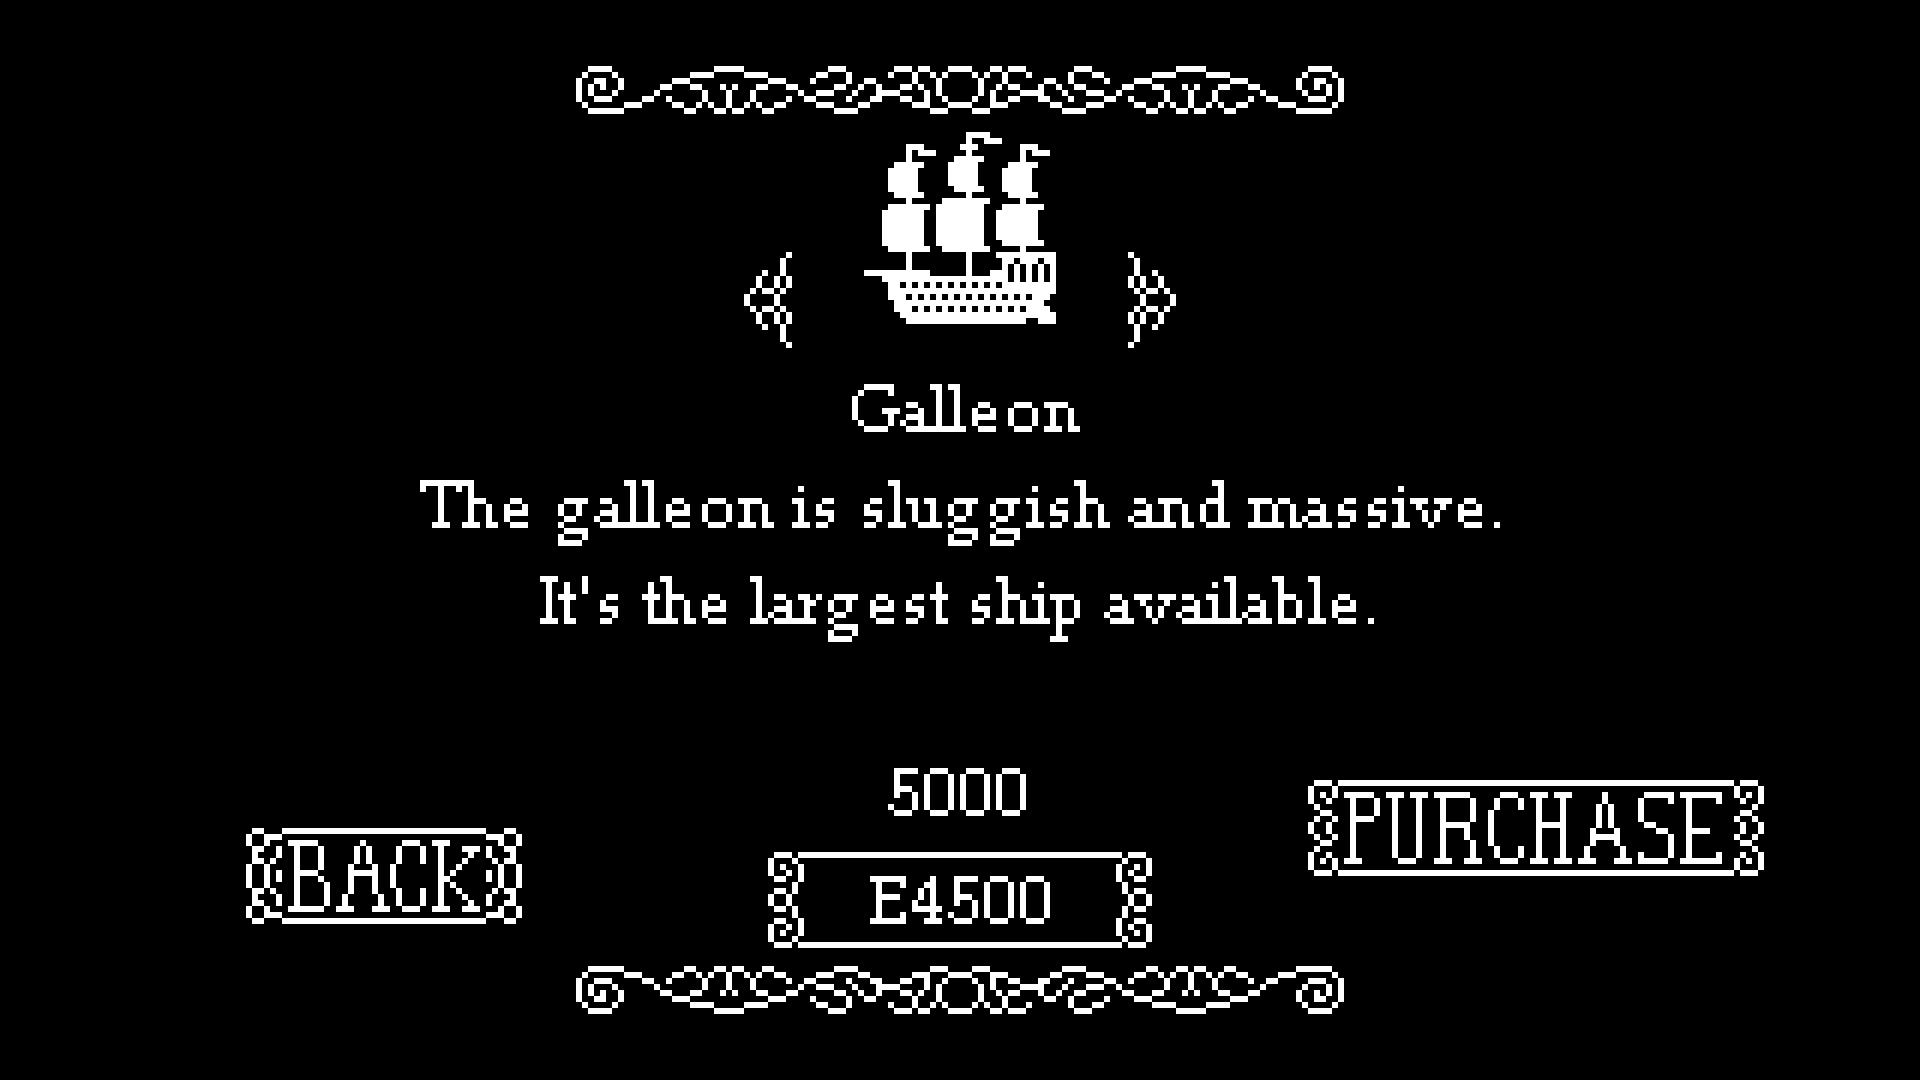 Ship Choosing Galleon